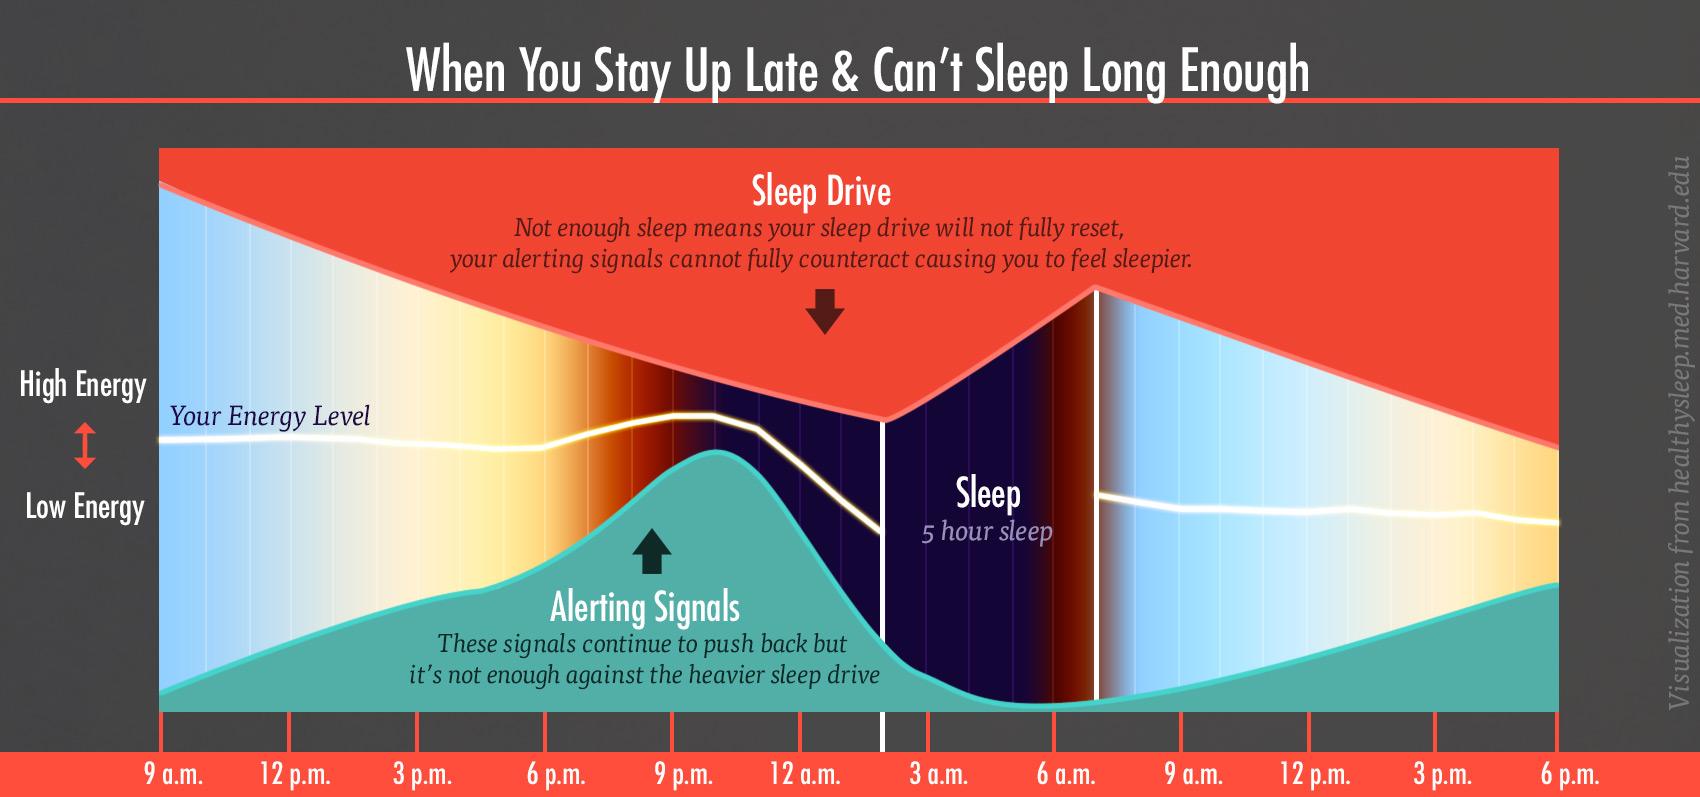 energy-levels-sleep-drive-alert-chart-2-bony-bombshell